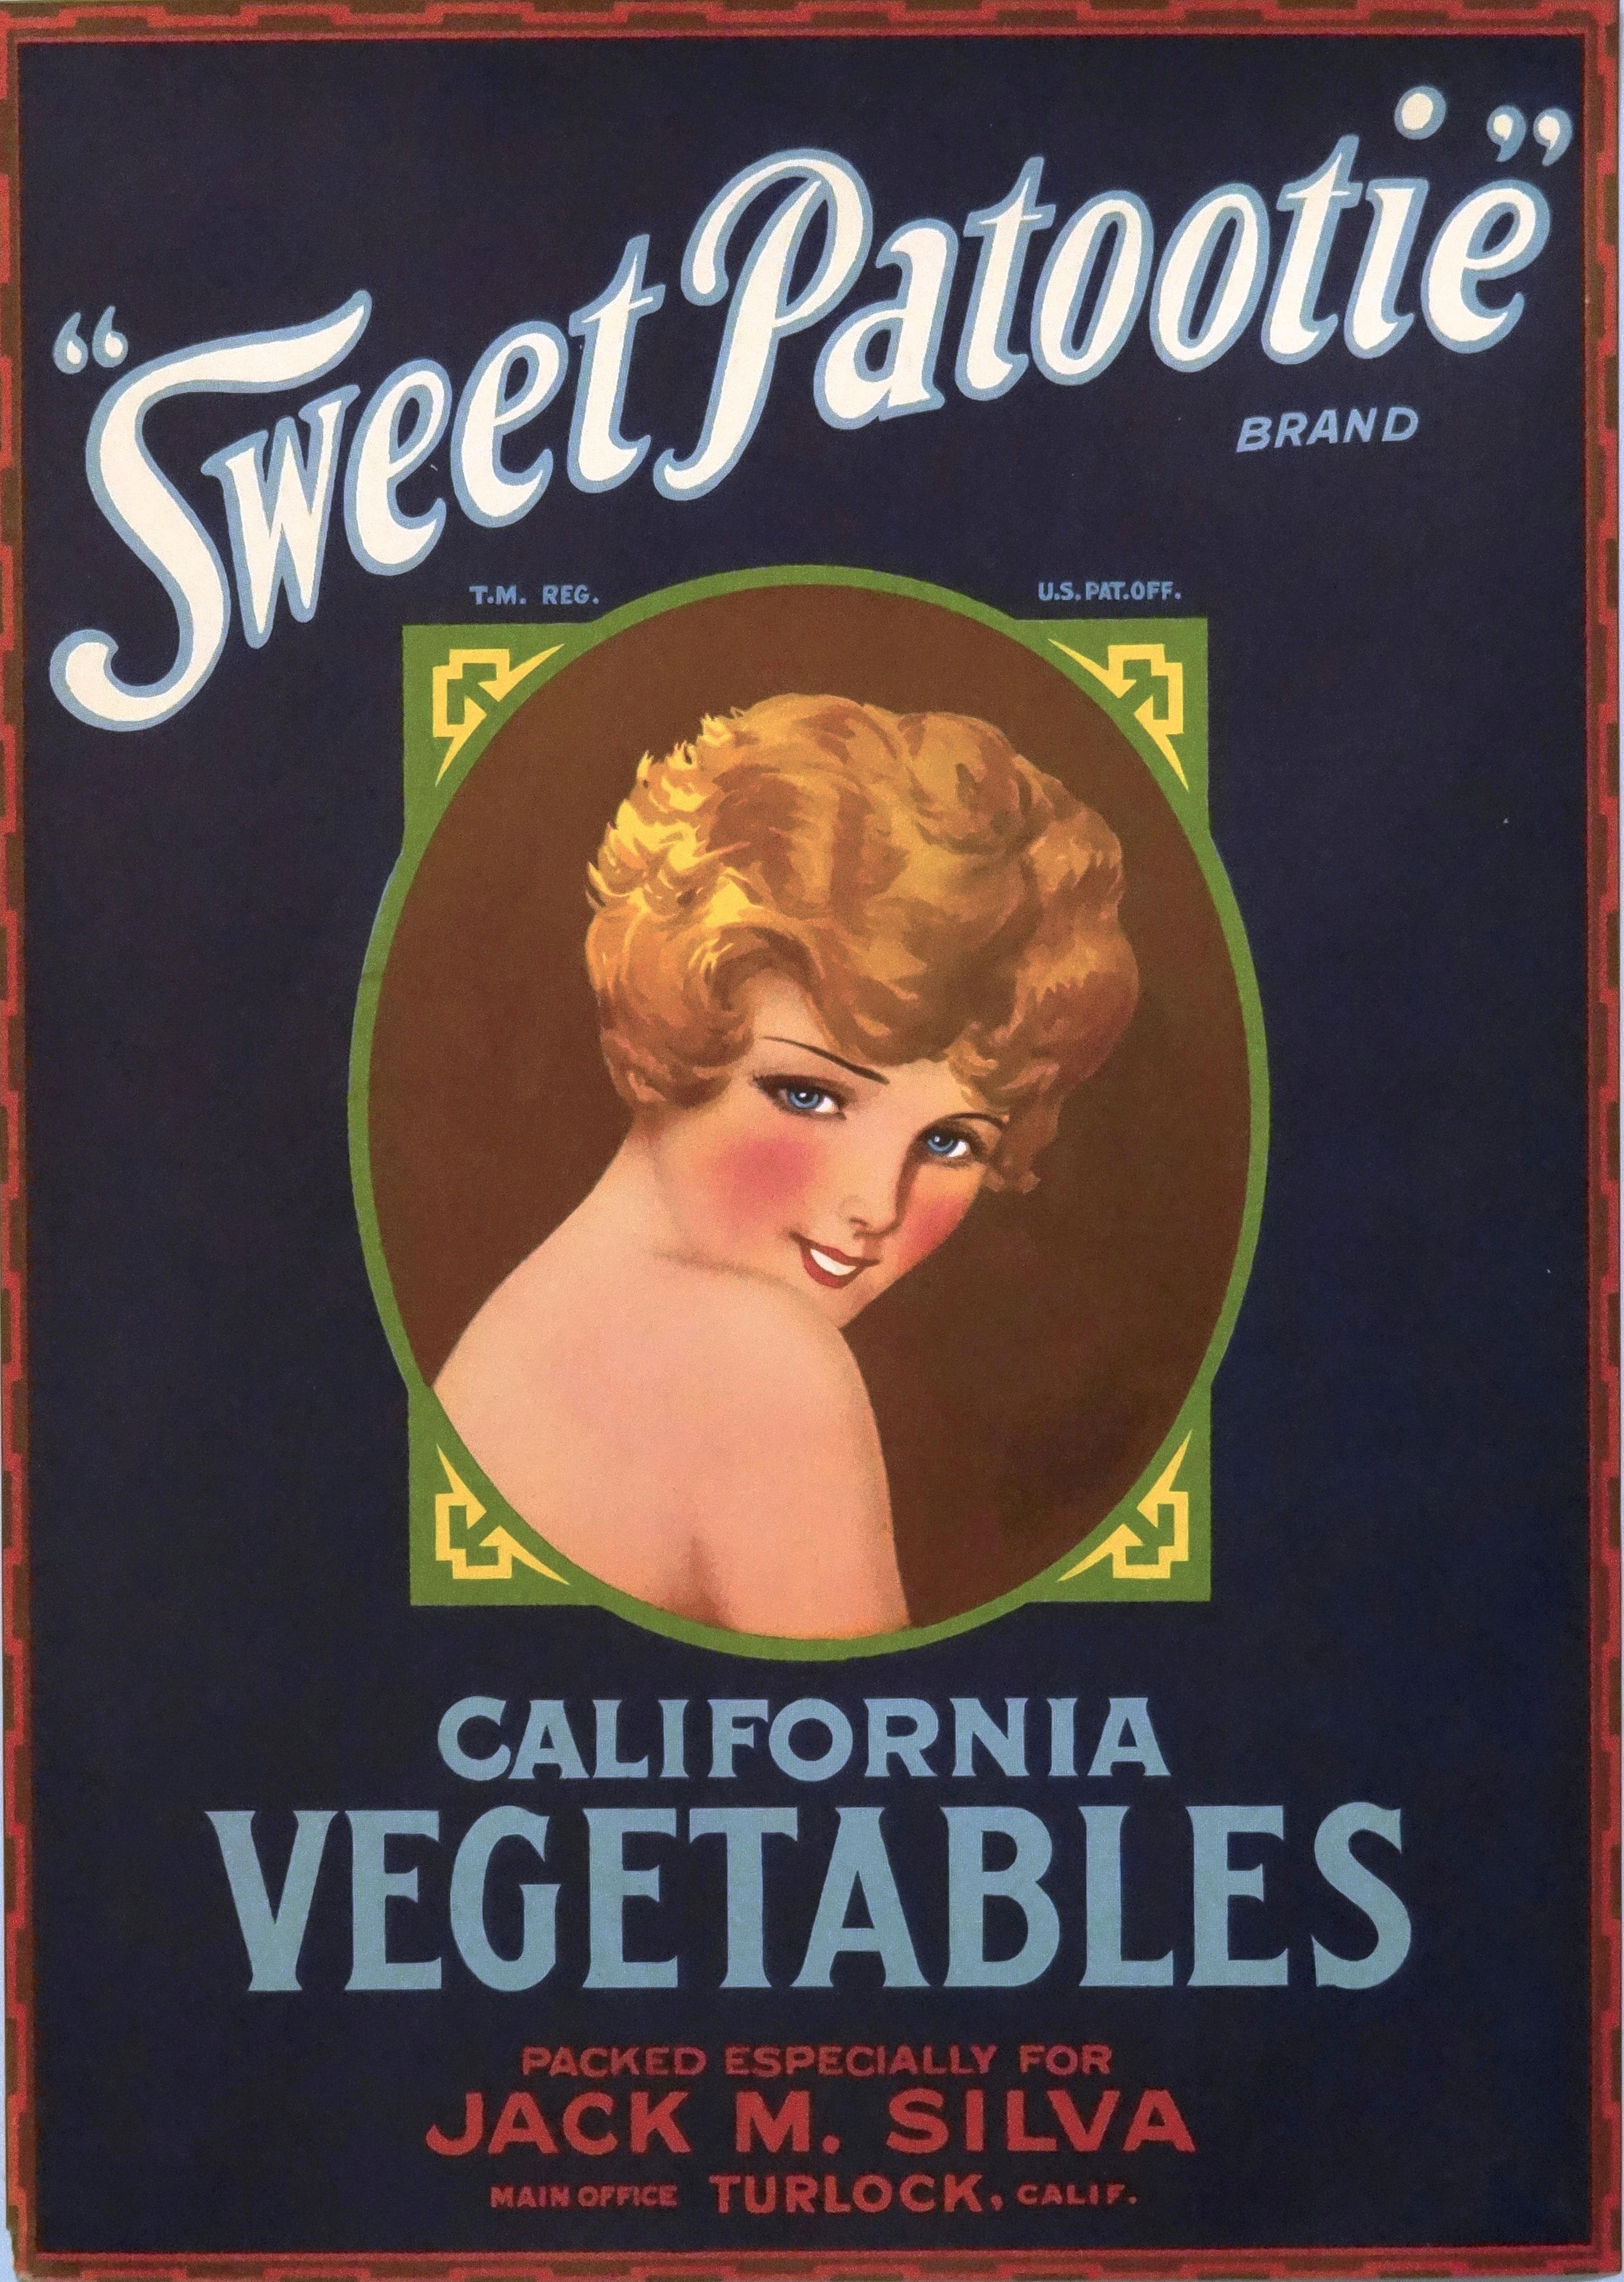 Sweet Patootie California Vegetables - 1920's